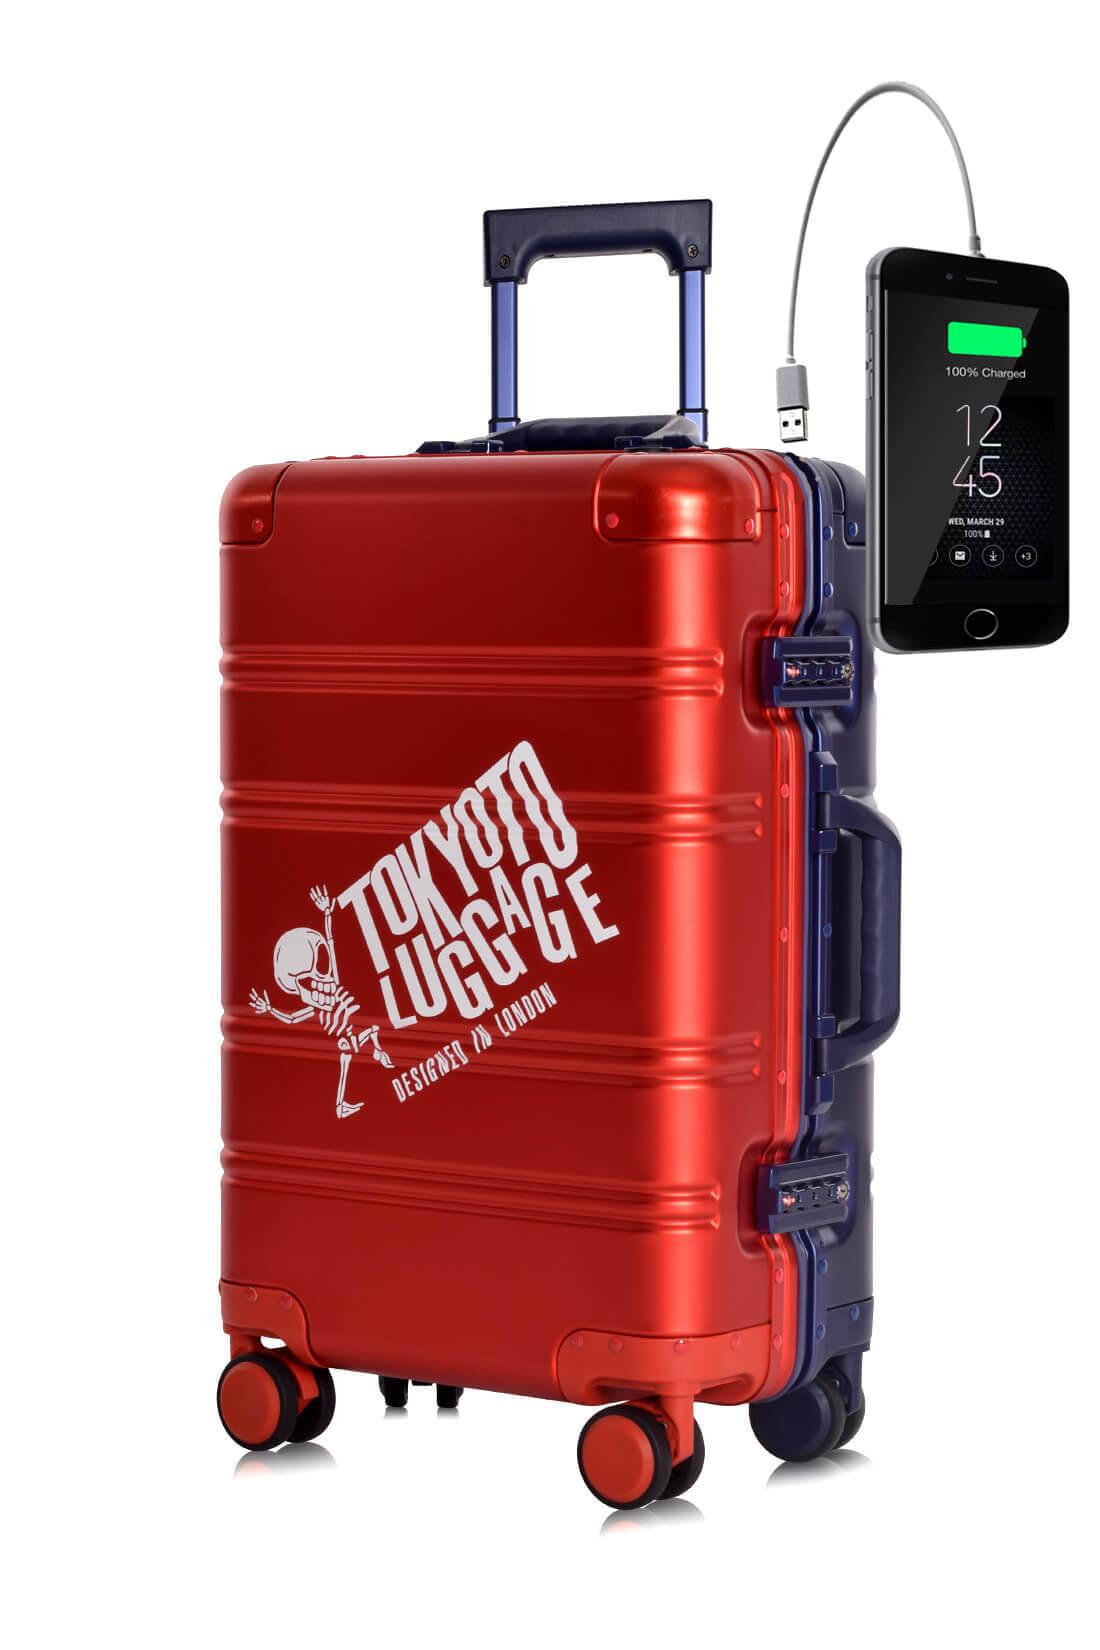 Aluminium Valise Online Cabine Trolley Enfant TOKYOTO LUGGAGE Modelle RED BLUE LOGO